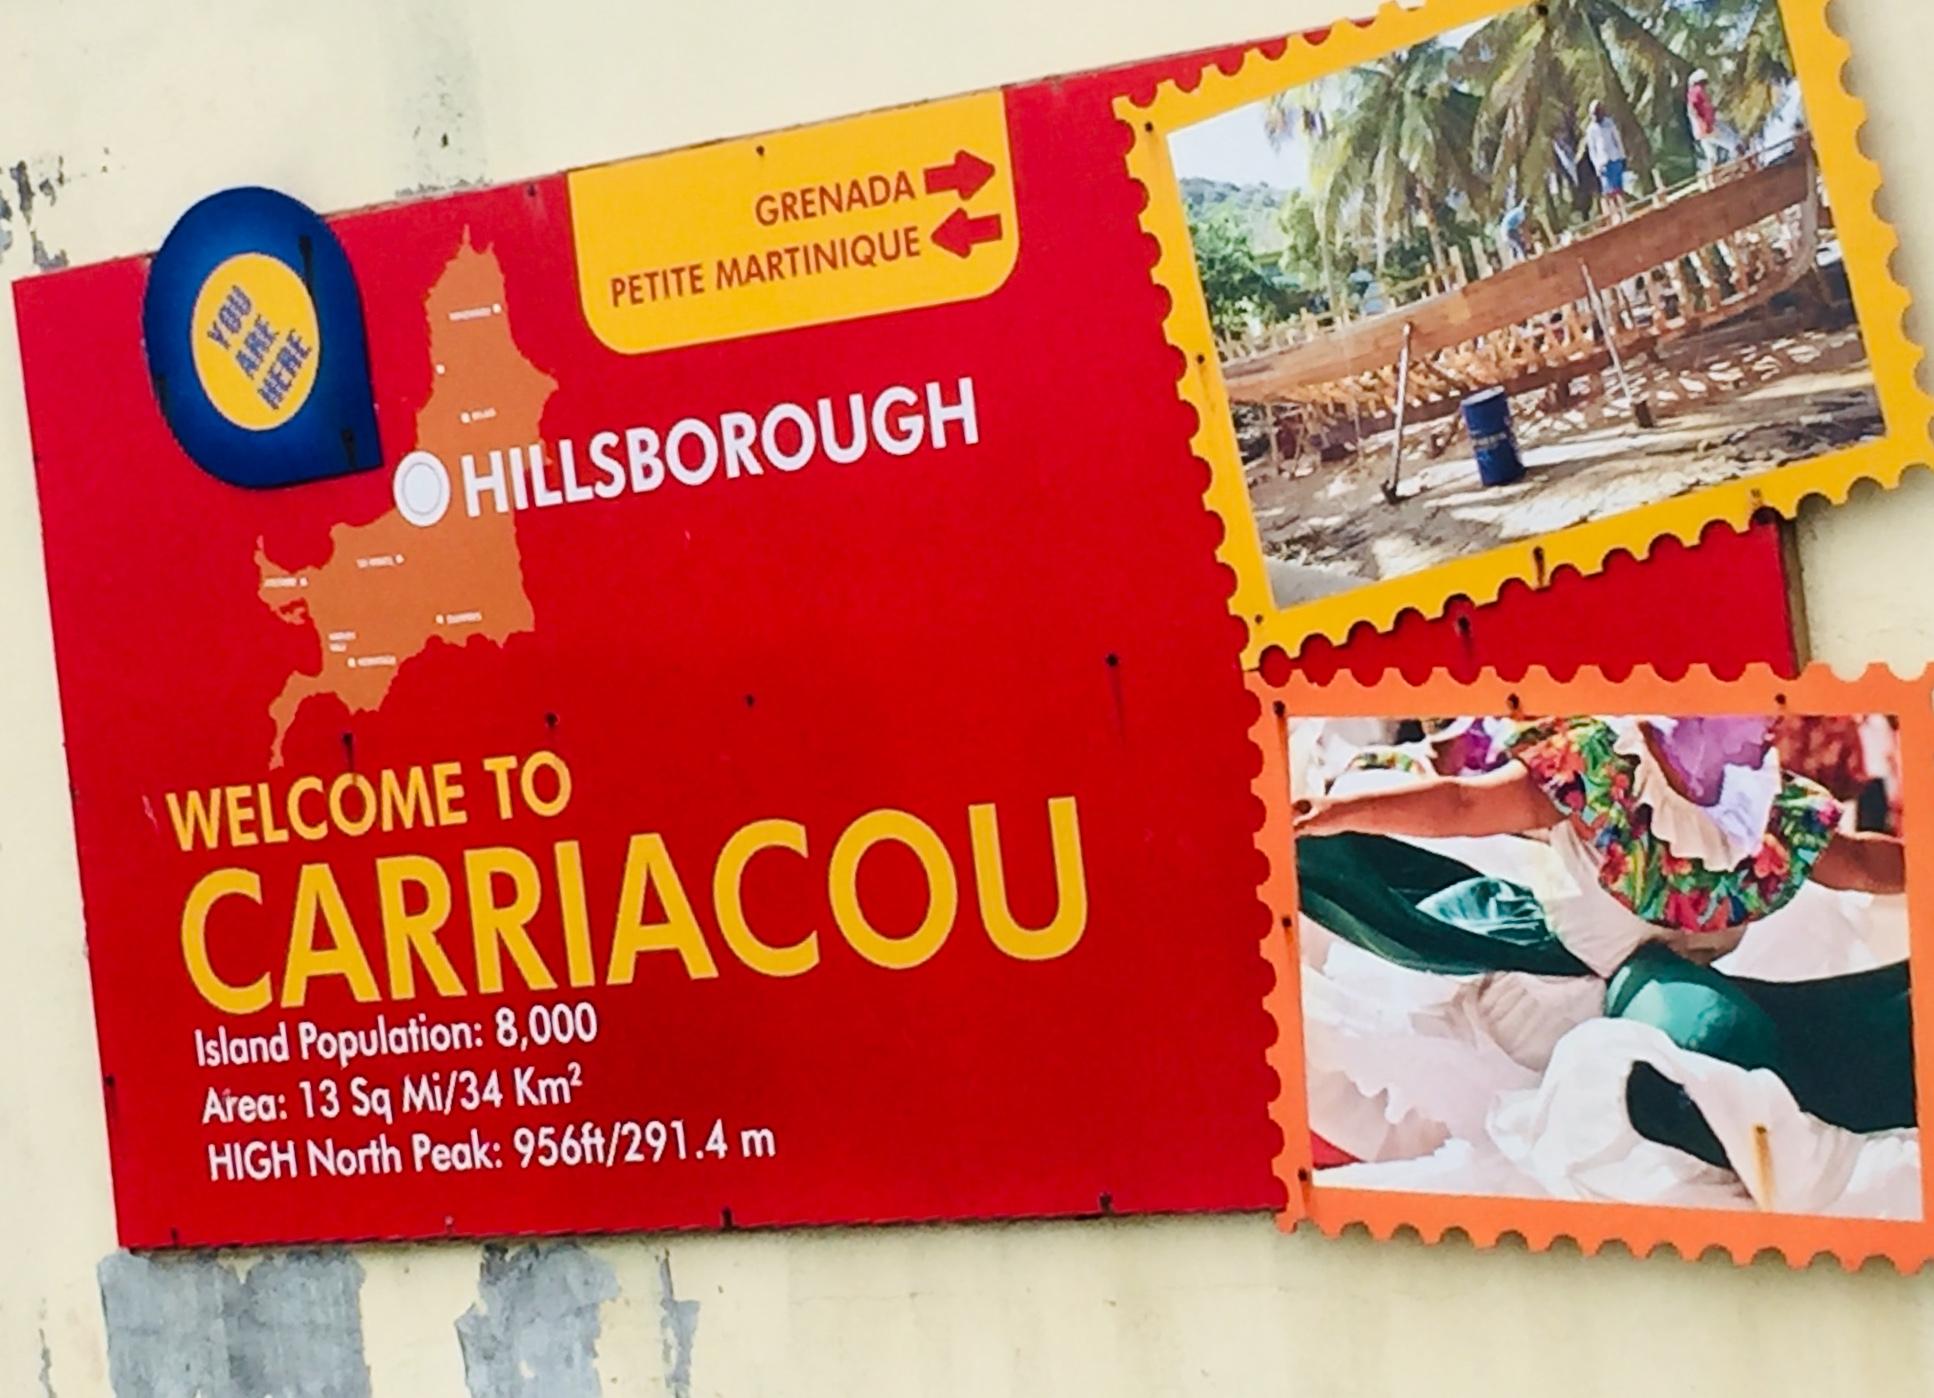 Carriacou Welcome Board